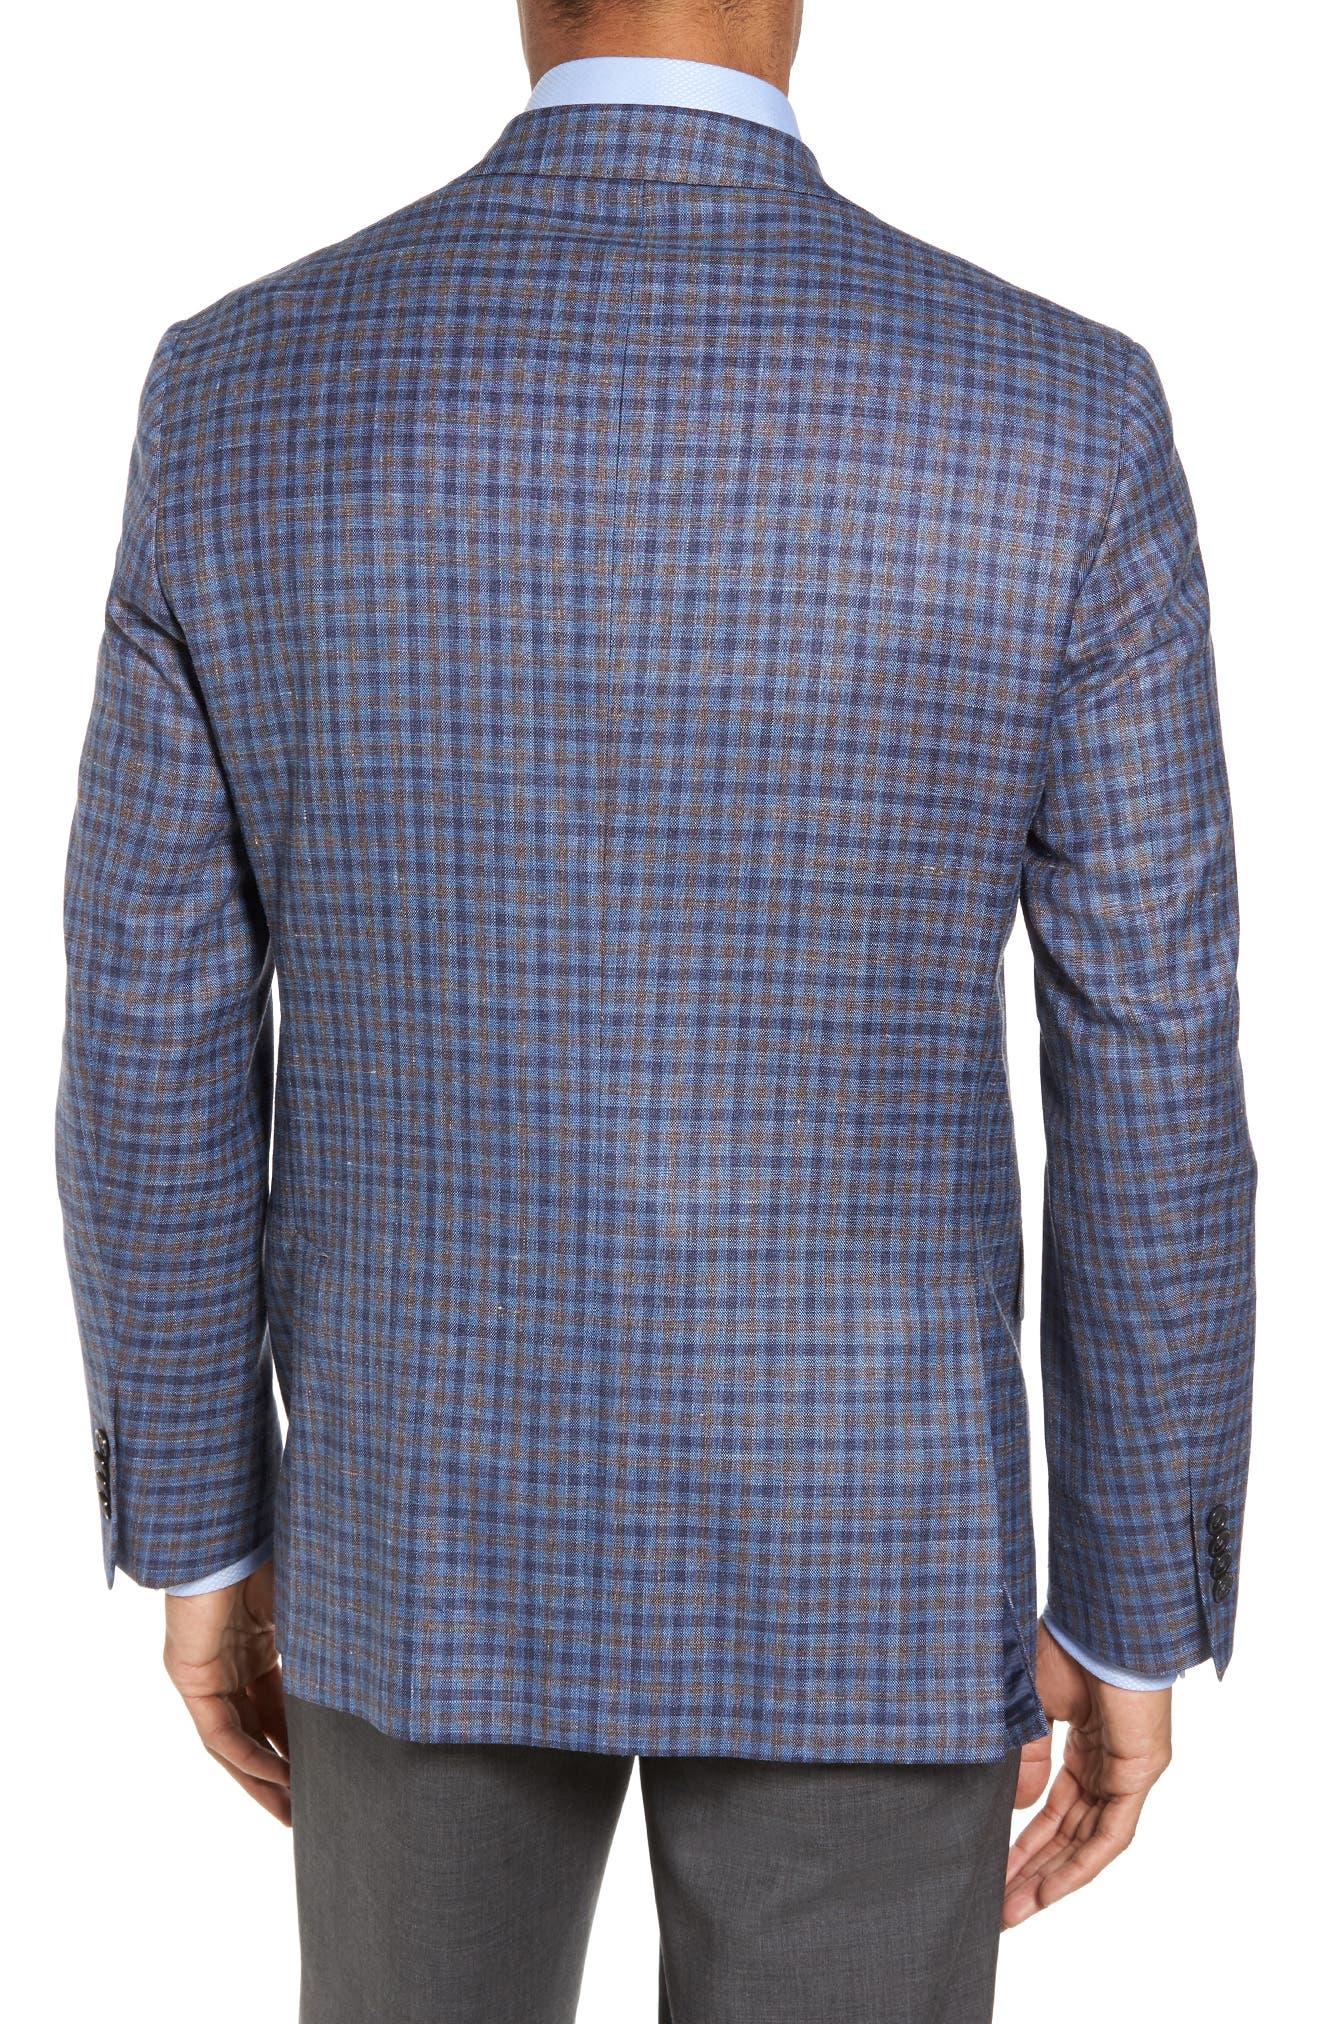 Alternate Image 2  - David Donahue Ashton Classic Fit Stretch Check Wool Blend Sport Coat